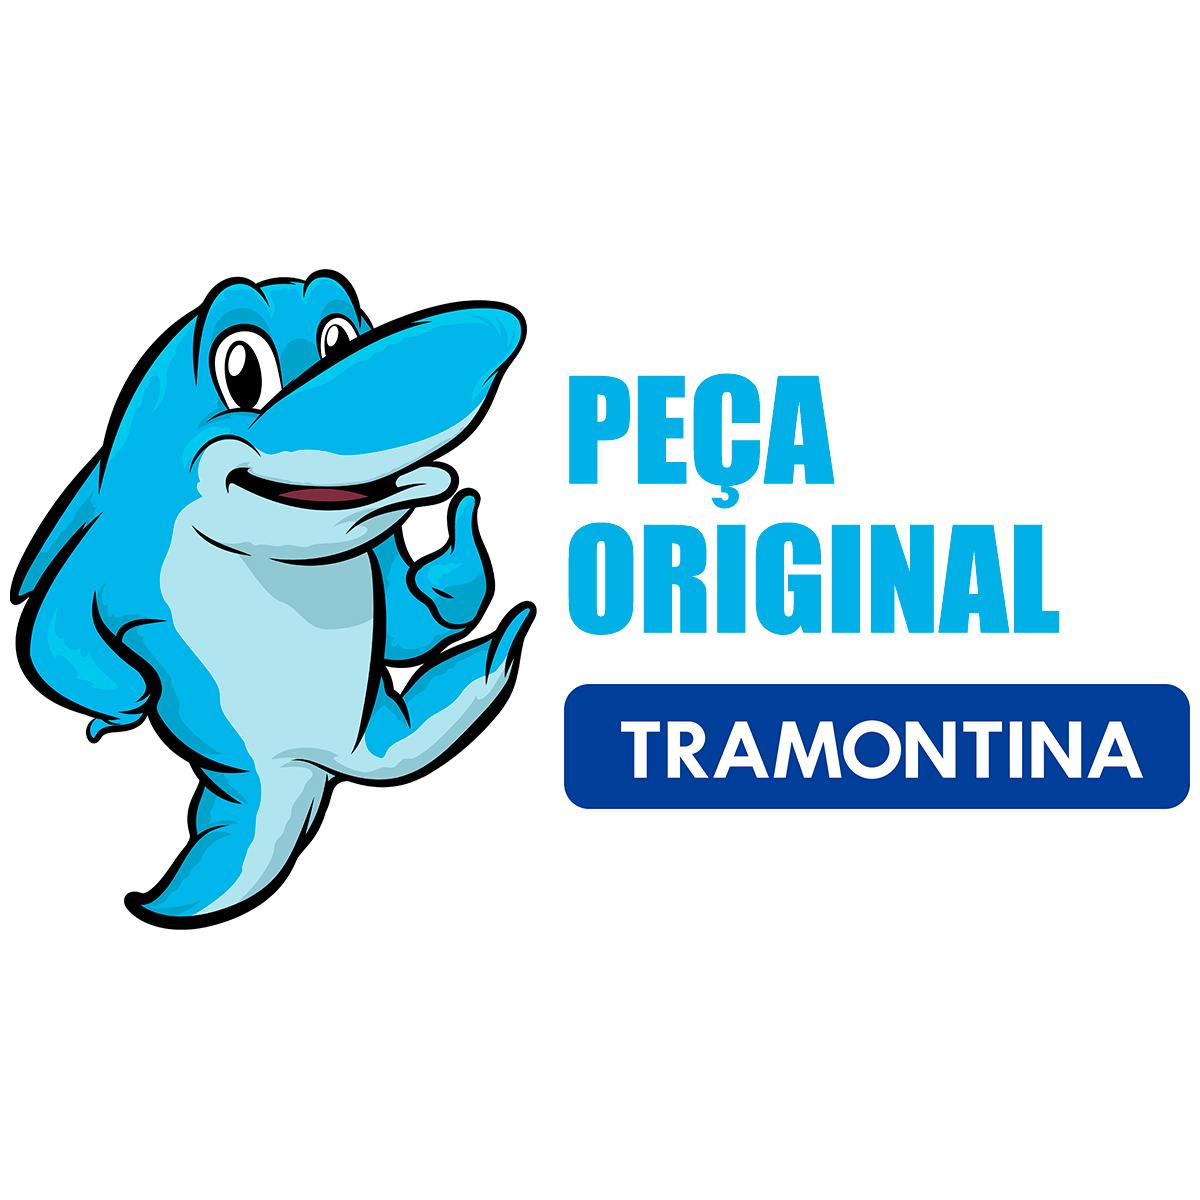 Kit Reparo para Lavadora Tramontina 1500psi 1200w, 1600psi 1400w, 1900psi 1800w 9pçs Original